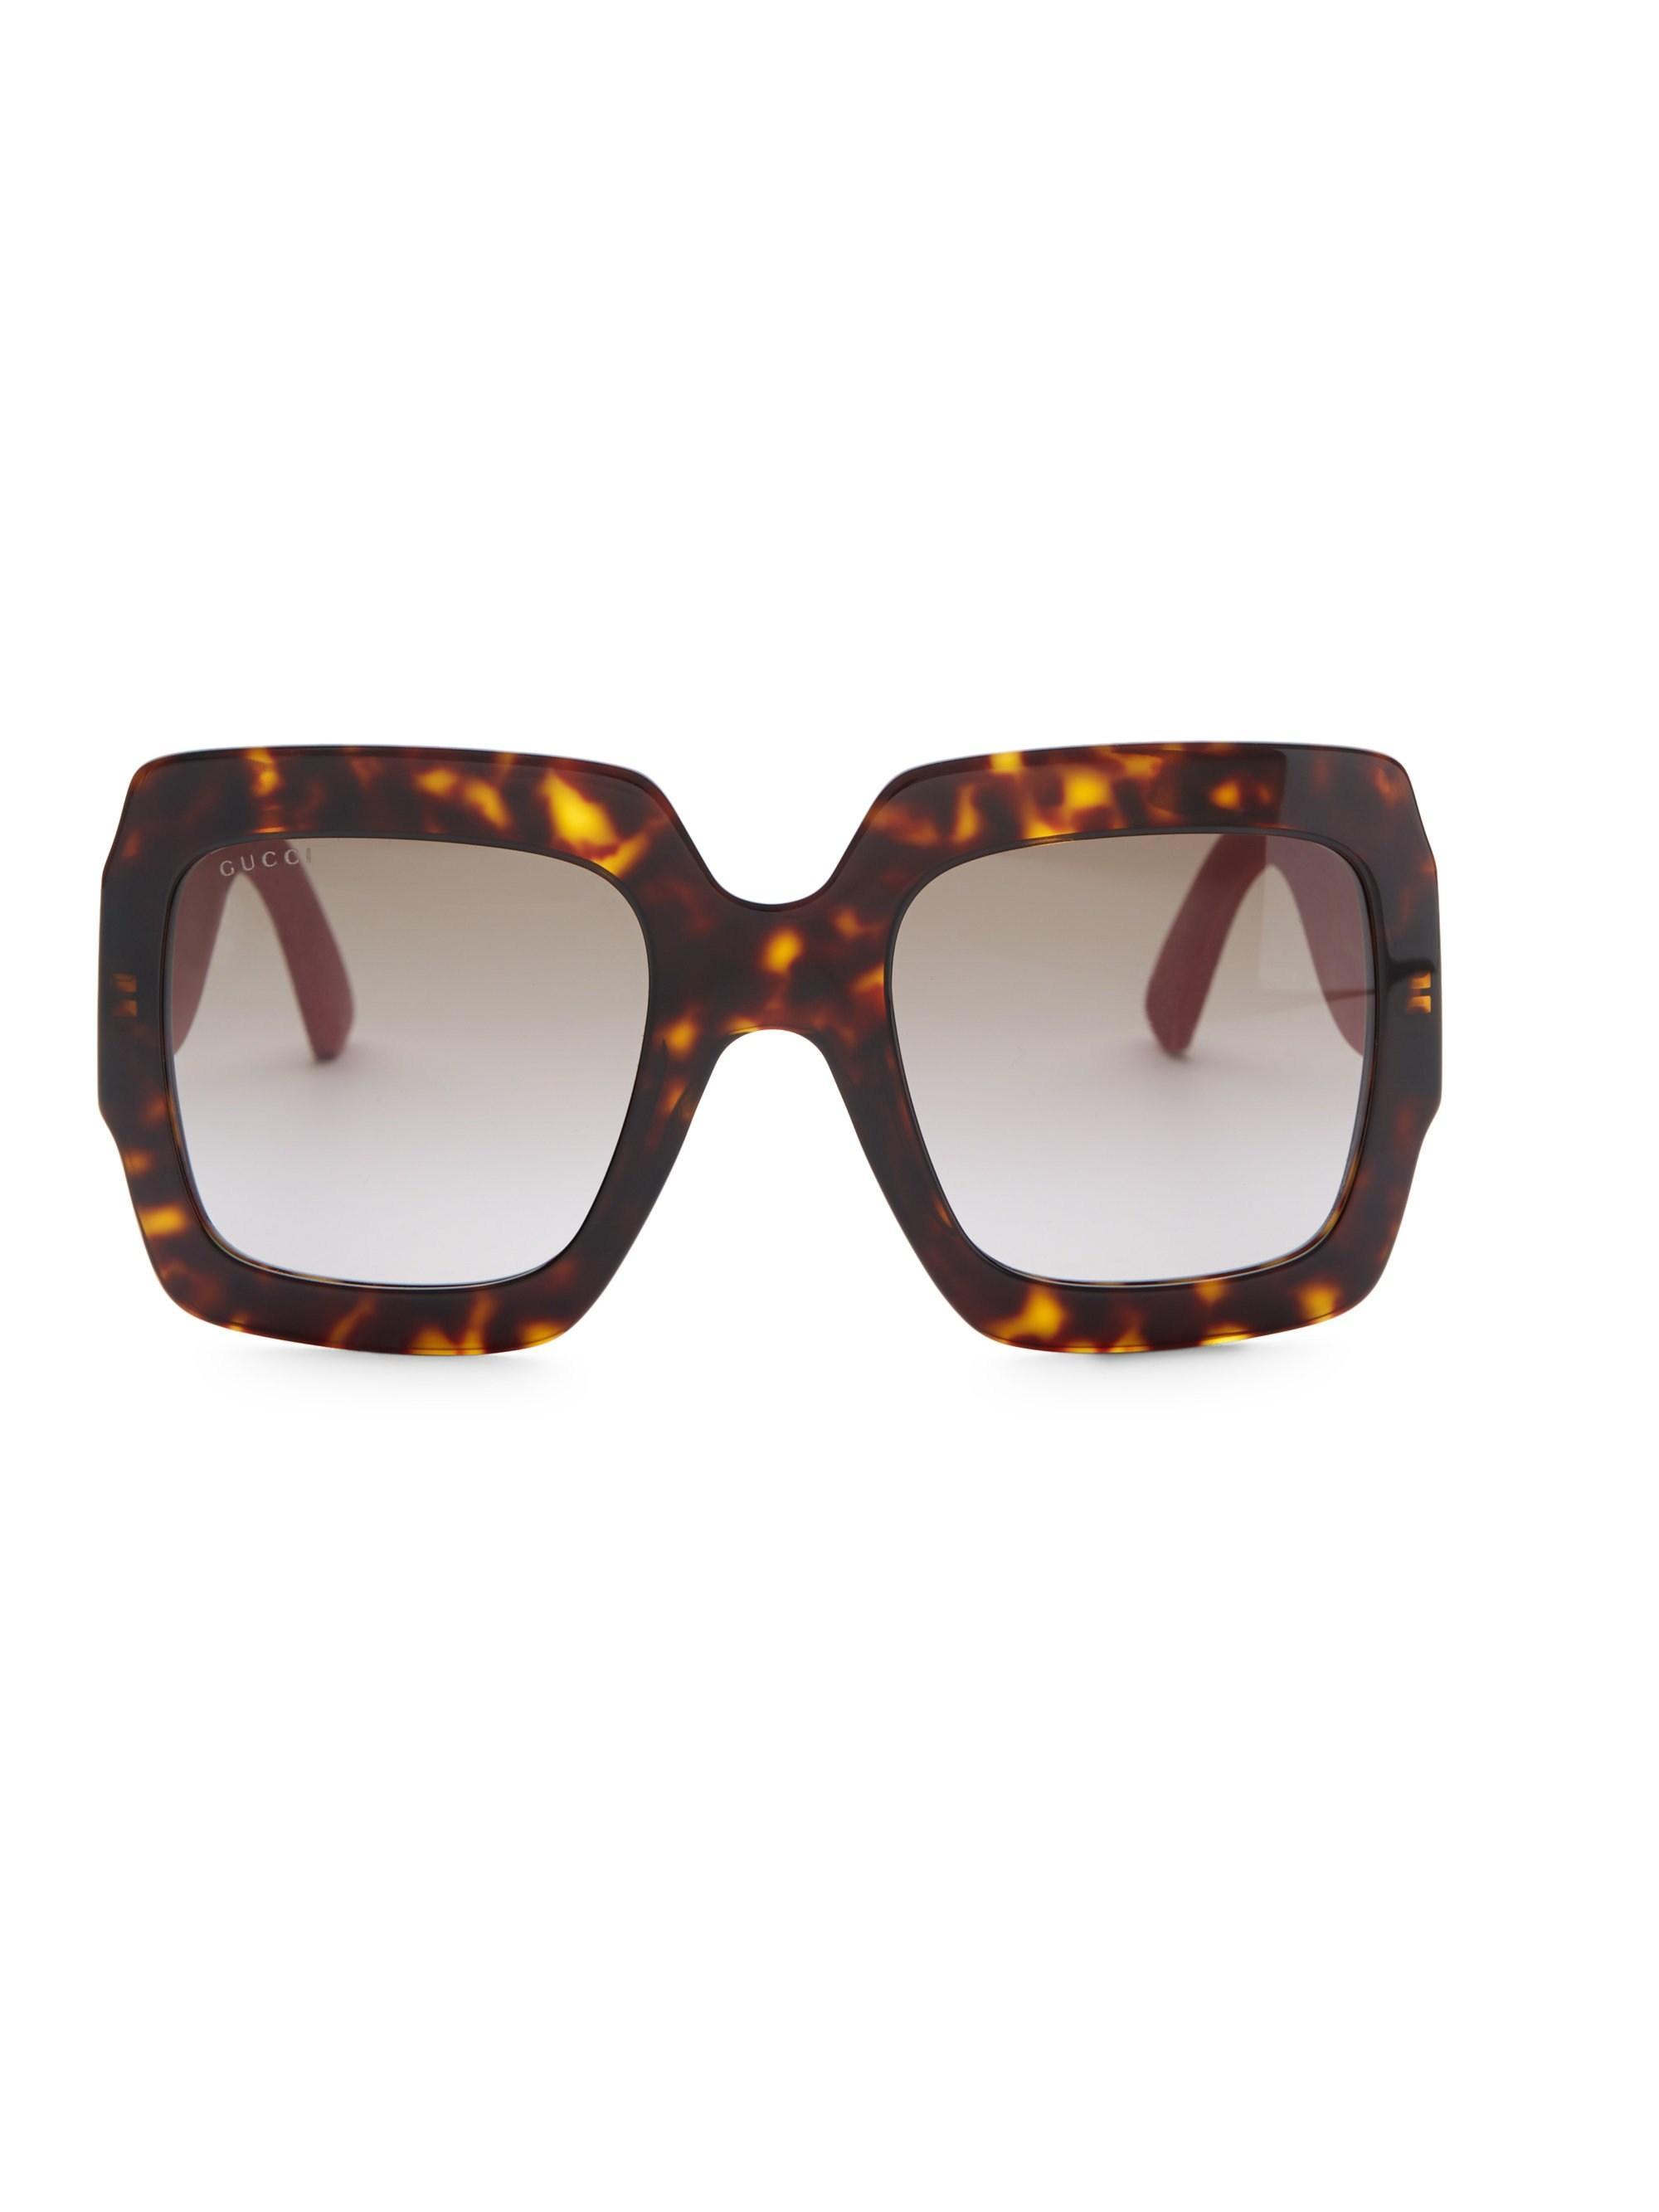 154cc30d08c8 Gucci - Multicolor 54mm Glitter-detail Square Sunglasses - Lyst. View  fullscreen